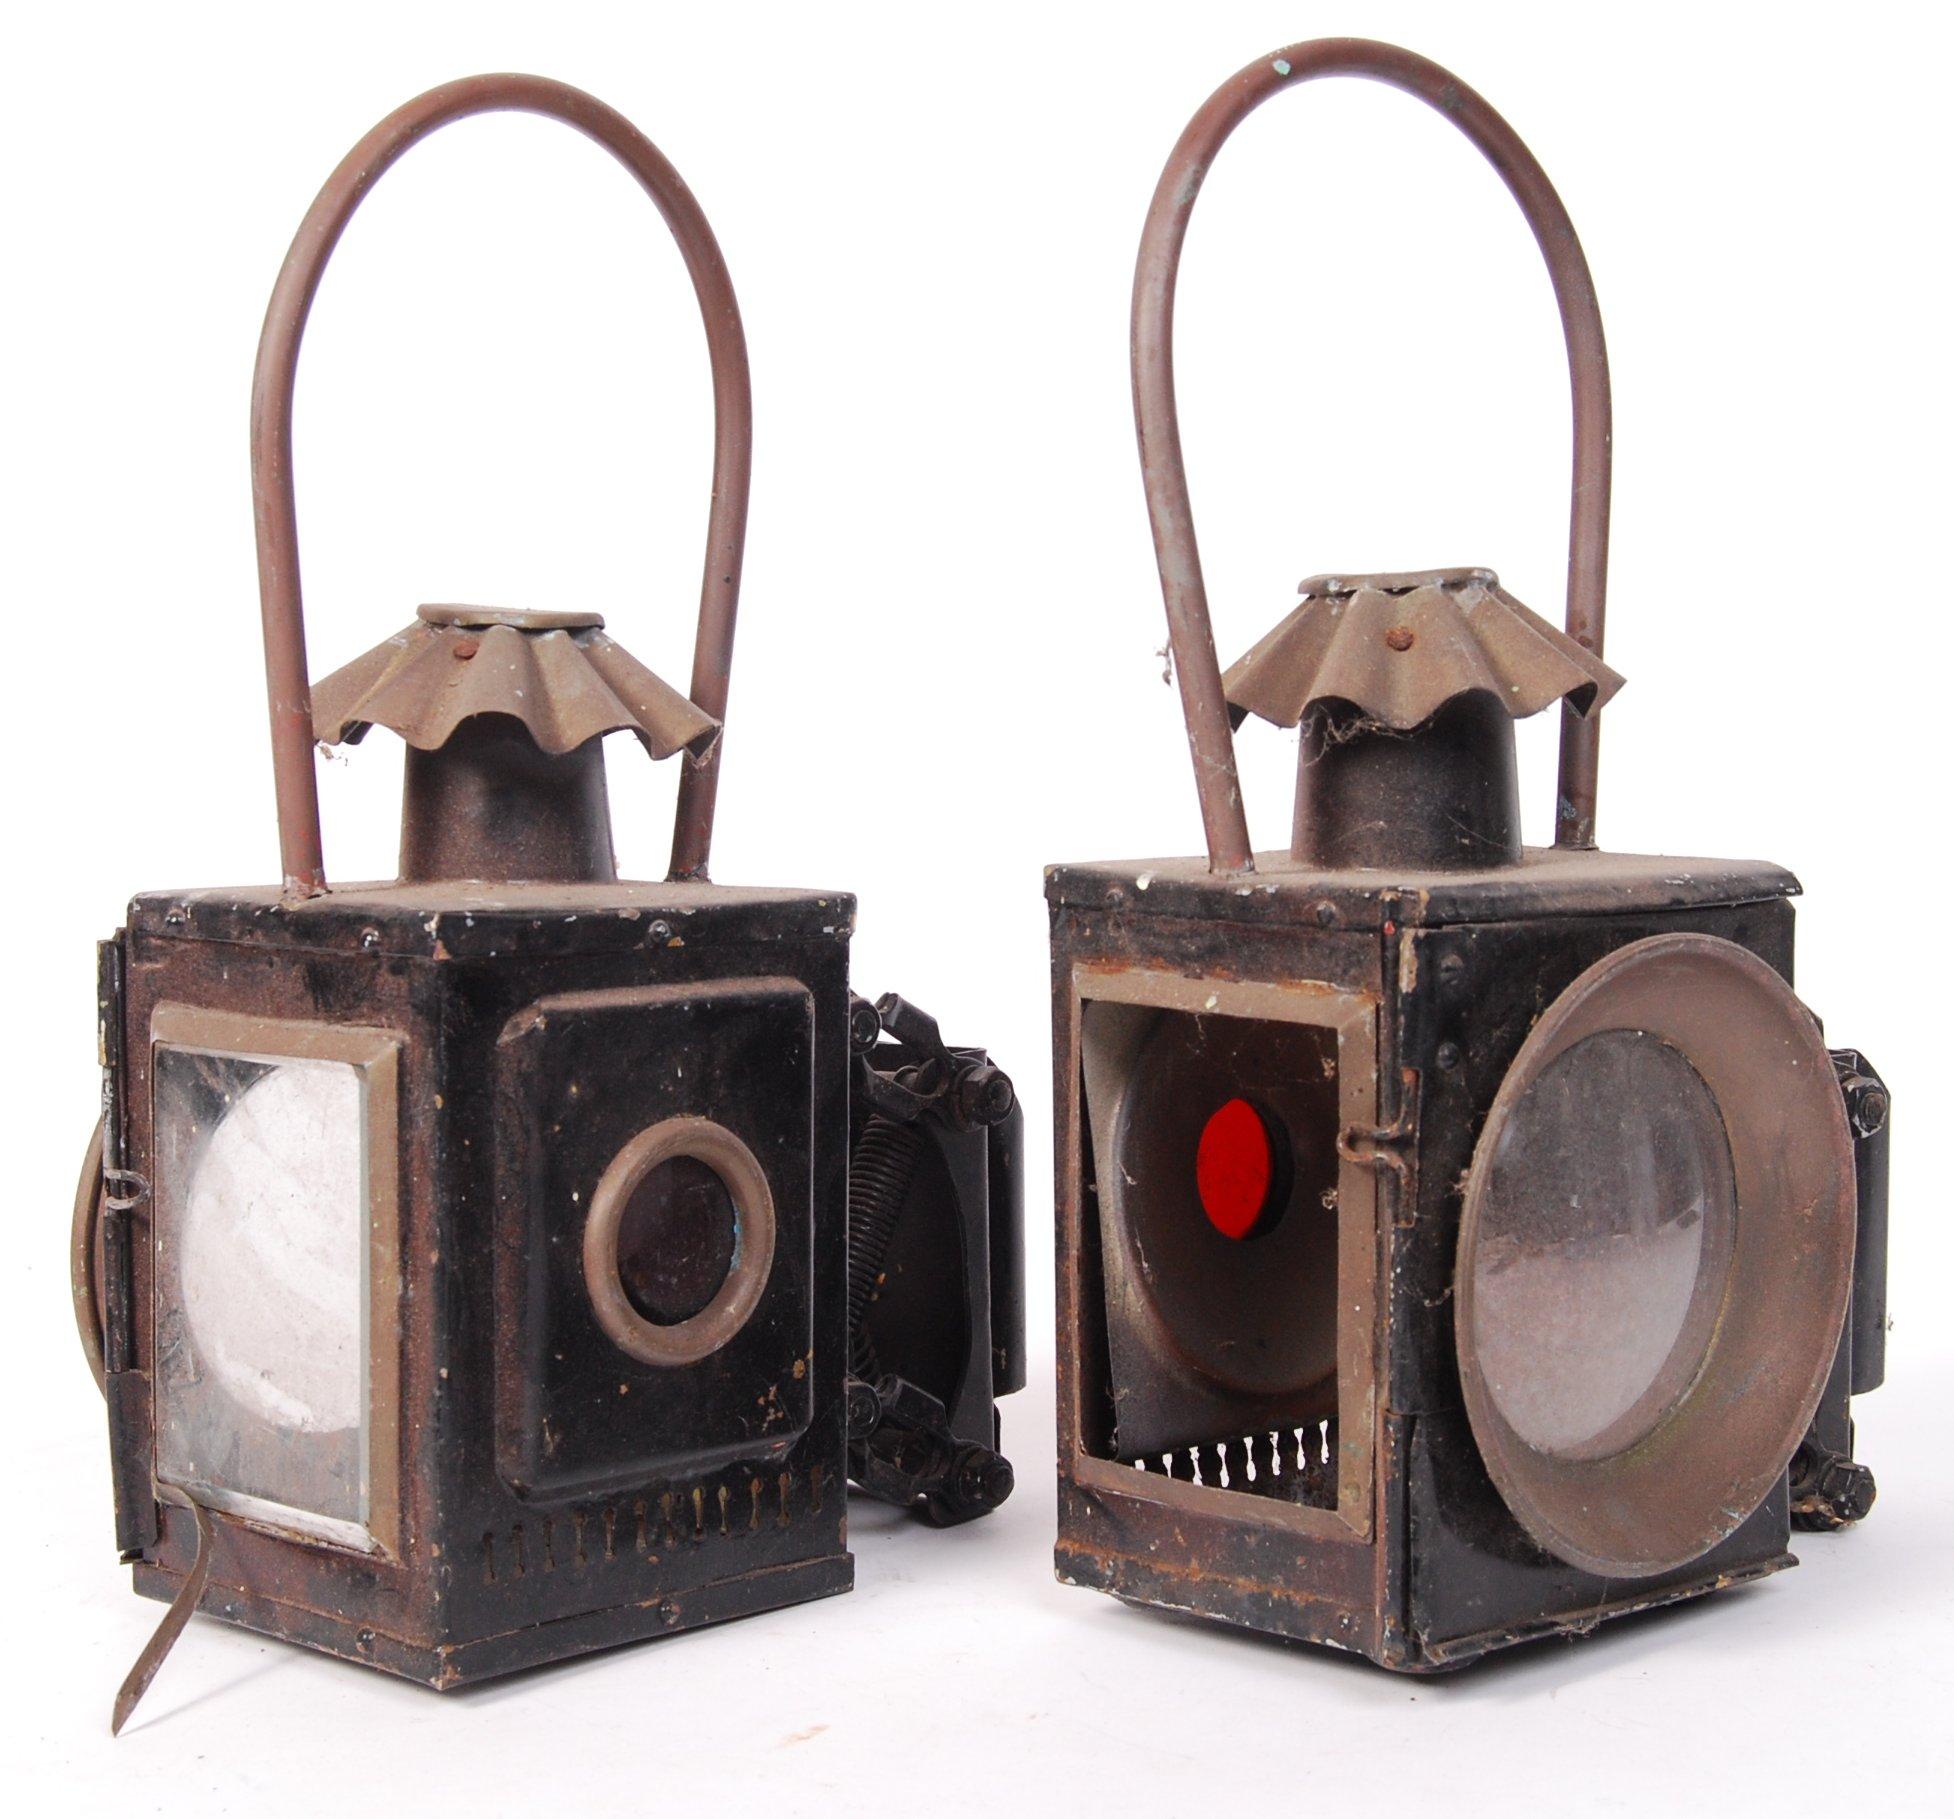 Lot 33 - PAIR OF ANTIQUE / VINTAGE RAILWAY / CARRIAGE LAMPS